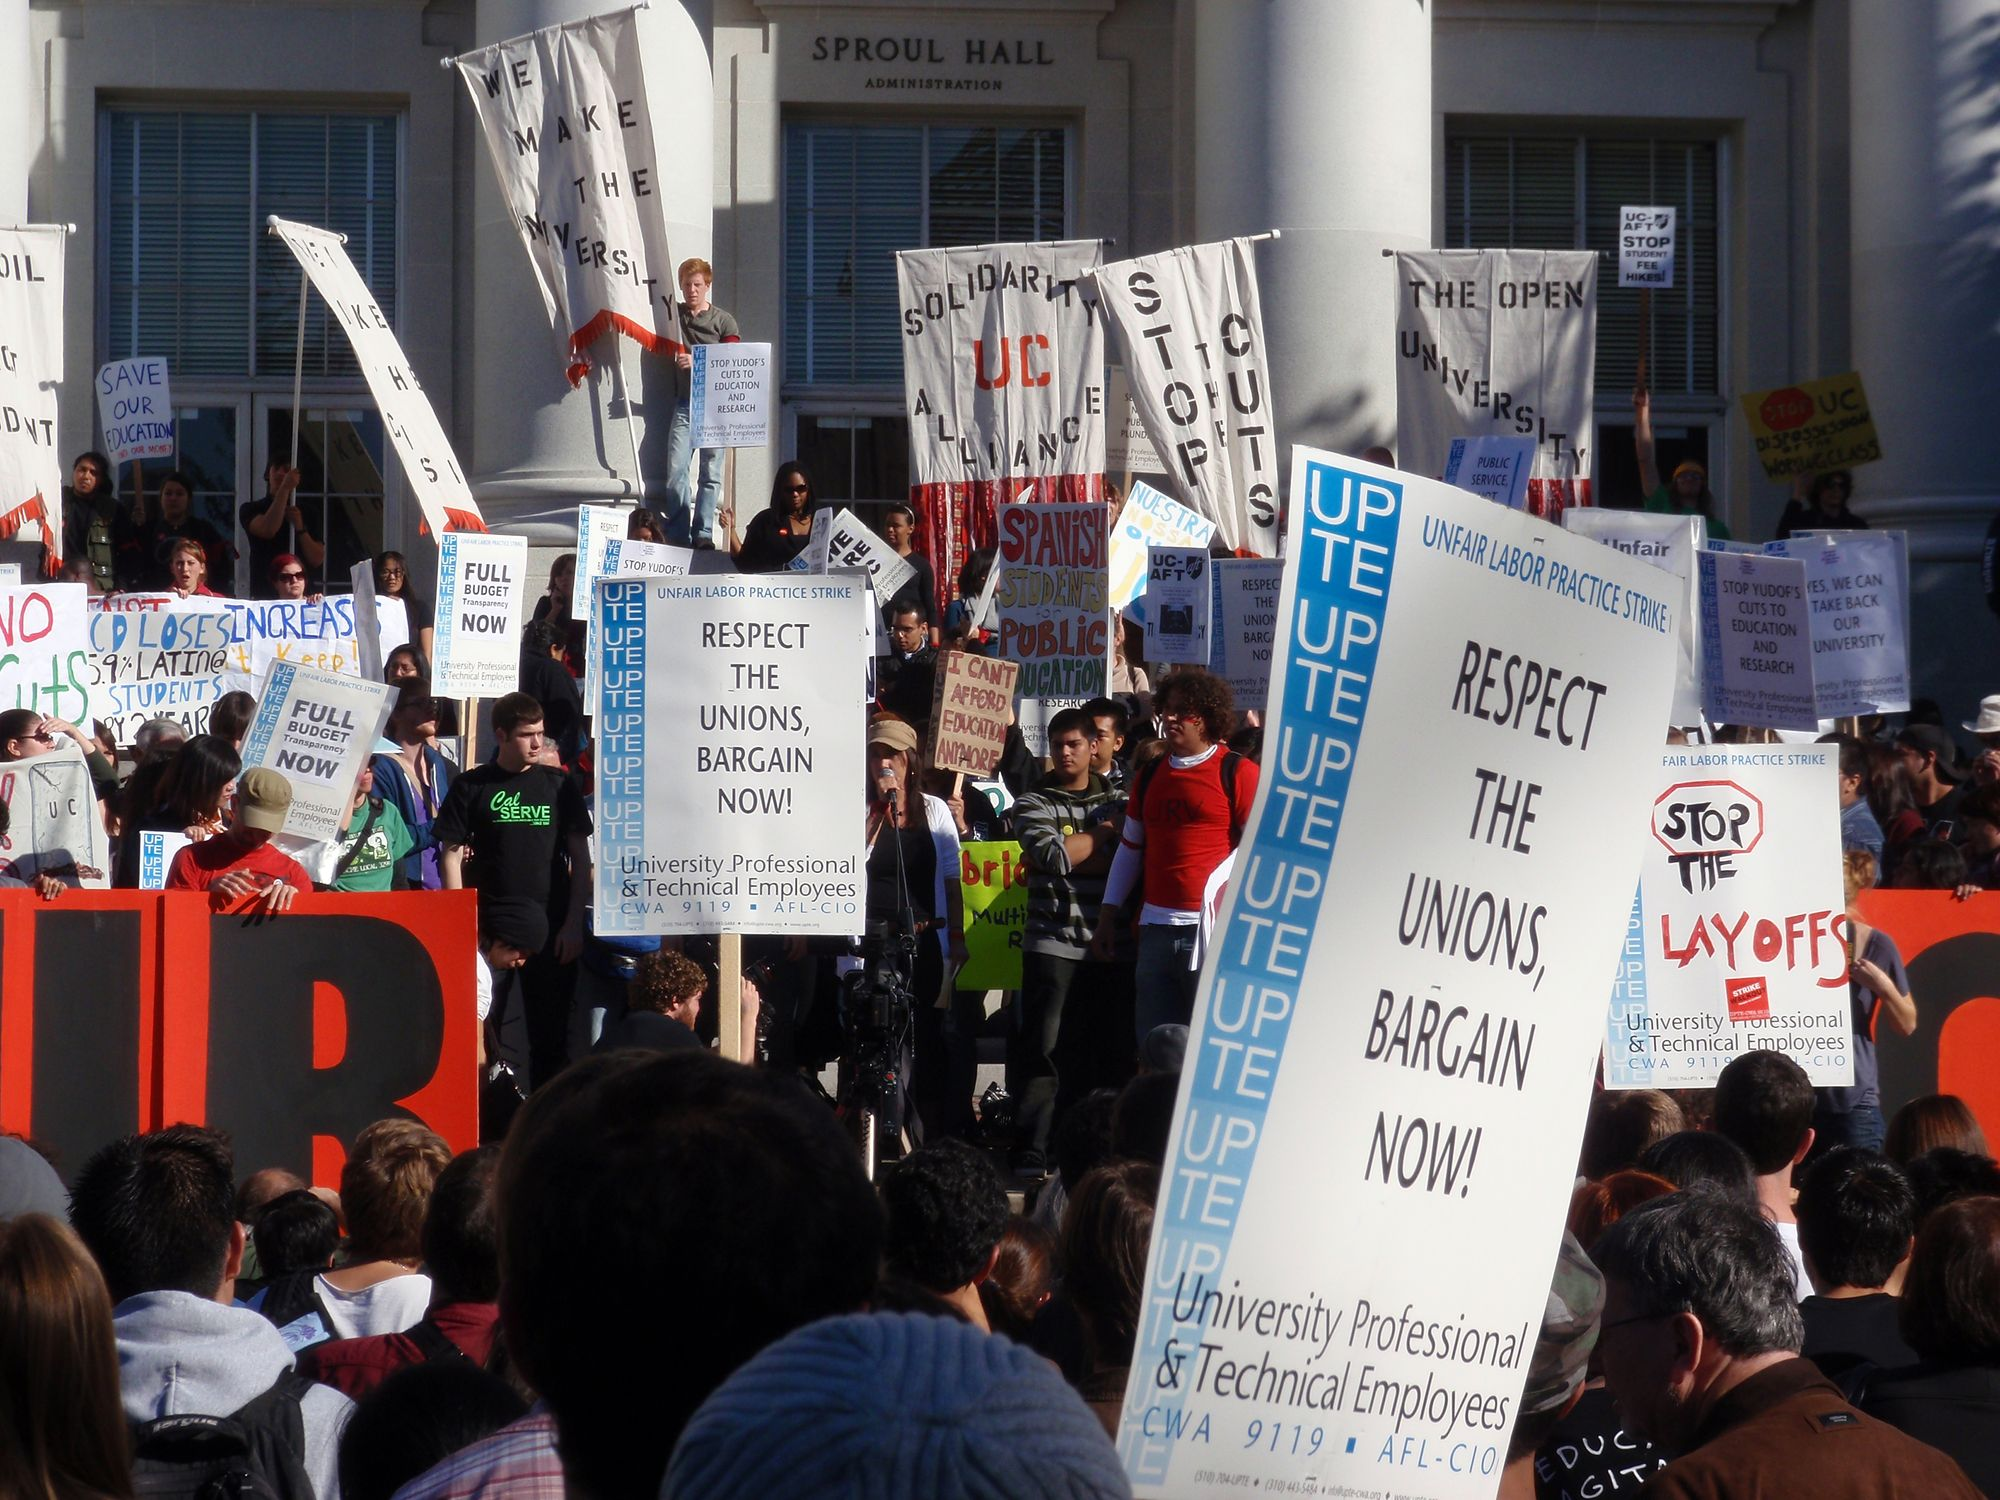 Teacher union protestors